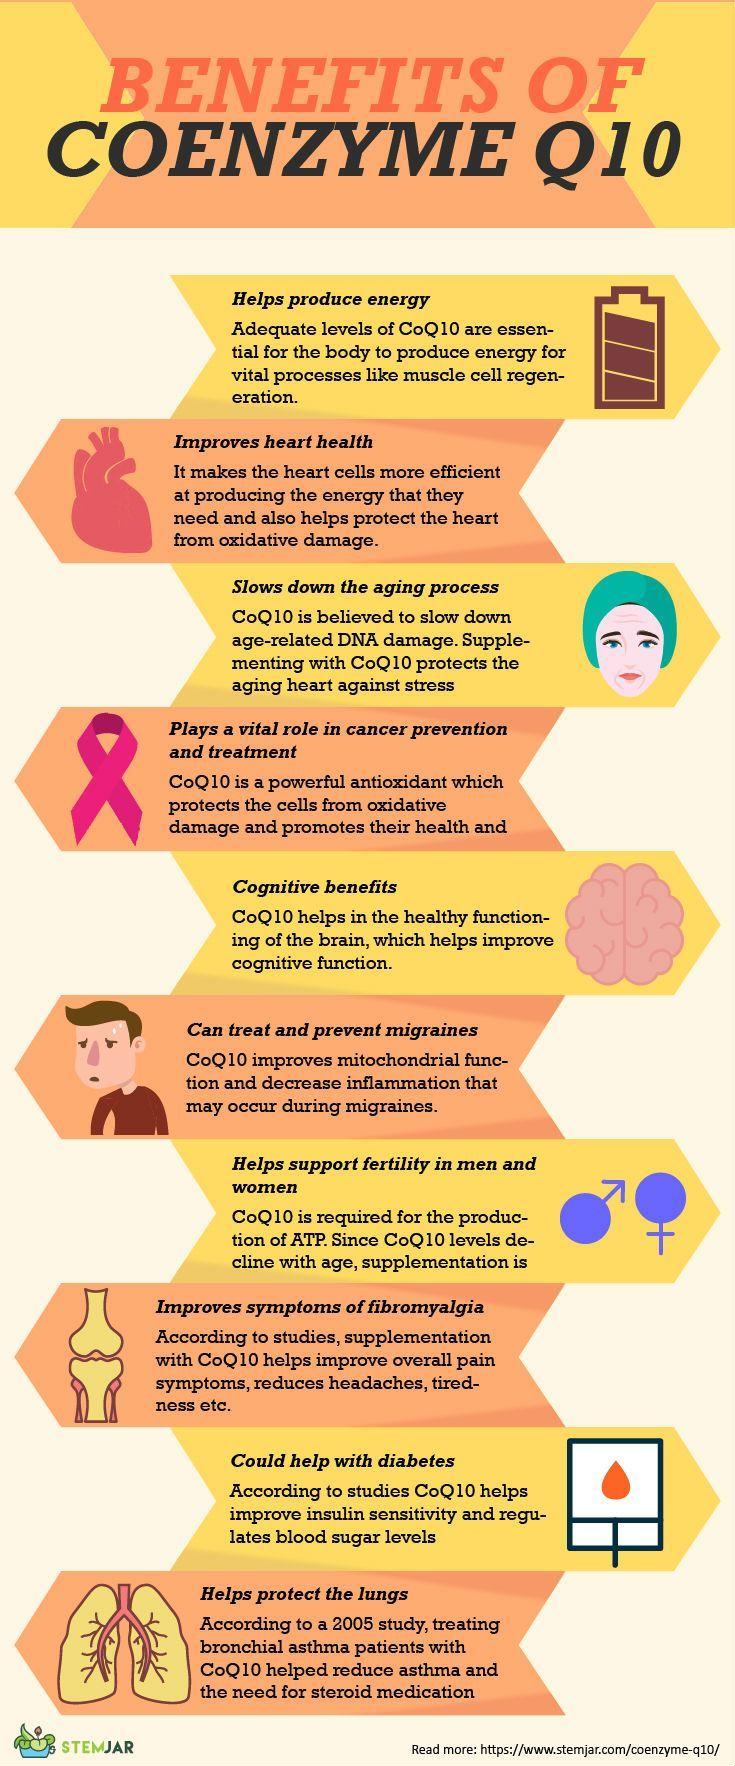 Top 10 Health Benefits Of Coenzyme Q10 Health Improve Heart Health Coenzyme